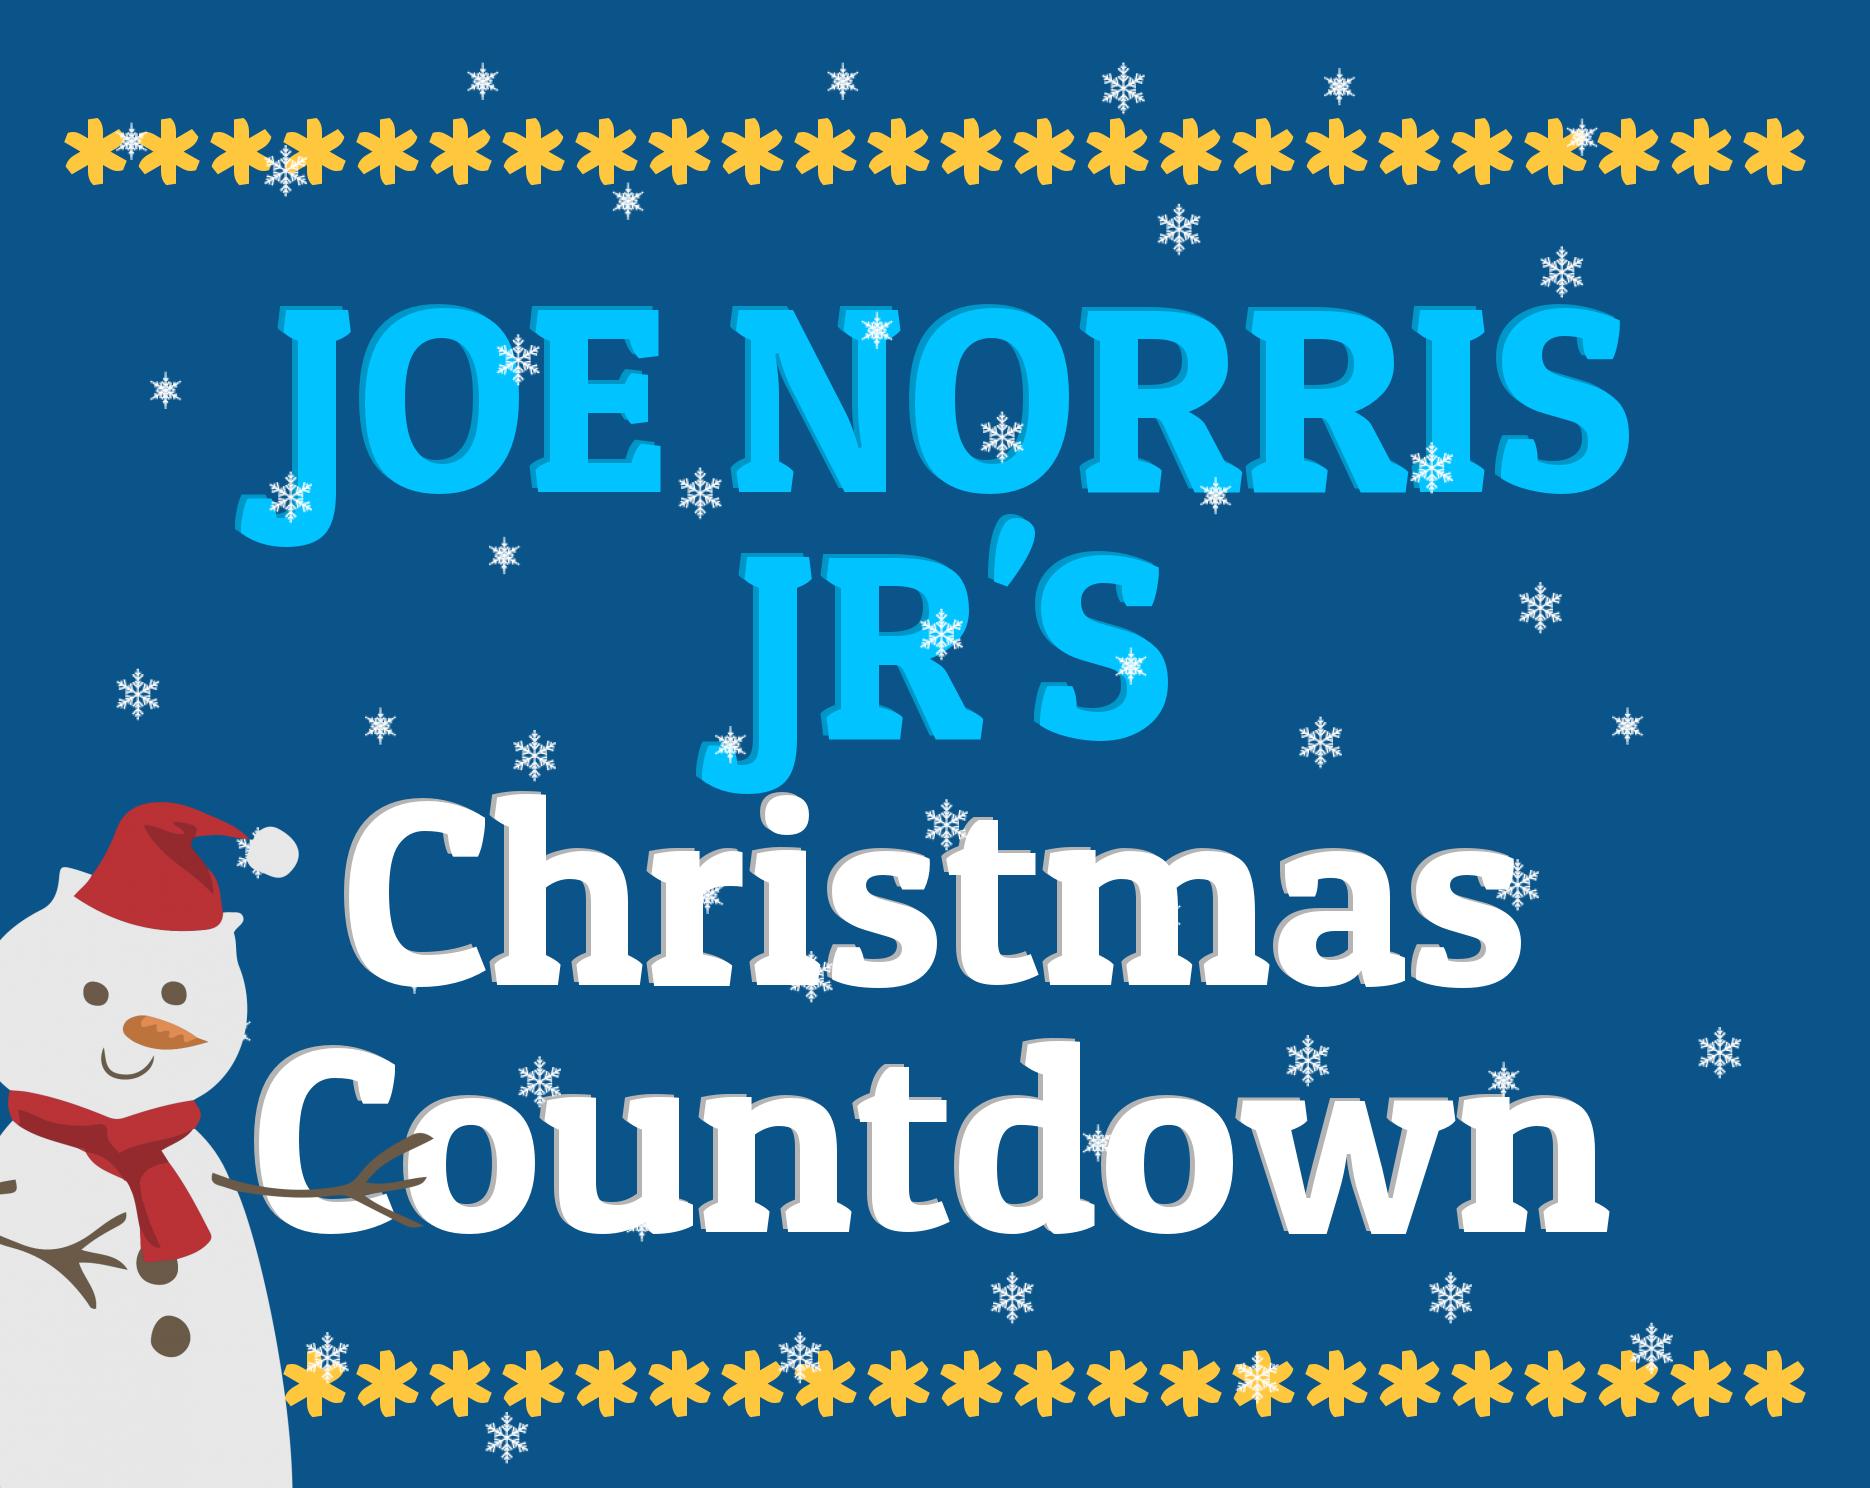 christmas countdown 2017 joe norris jr how many days till christmas 2017 - How Many Days Left For Christmas